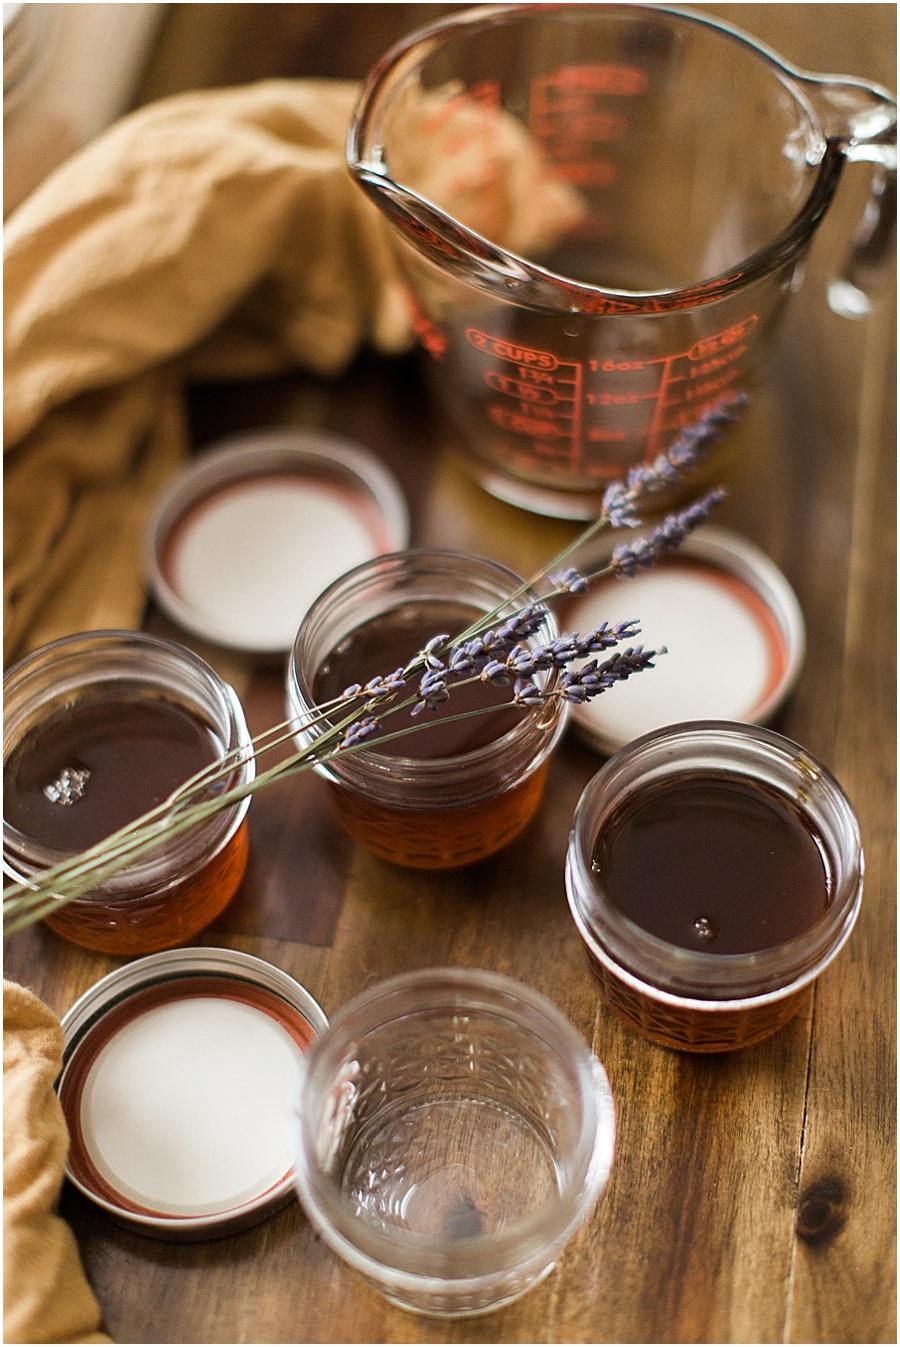 quaint-and-whim-baking-honey-lavender-4923.jpg